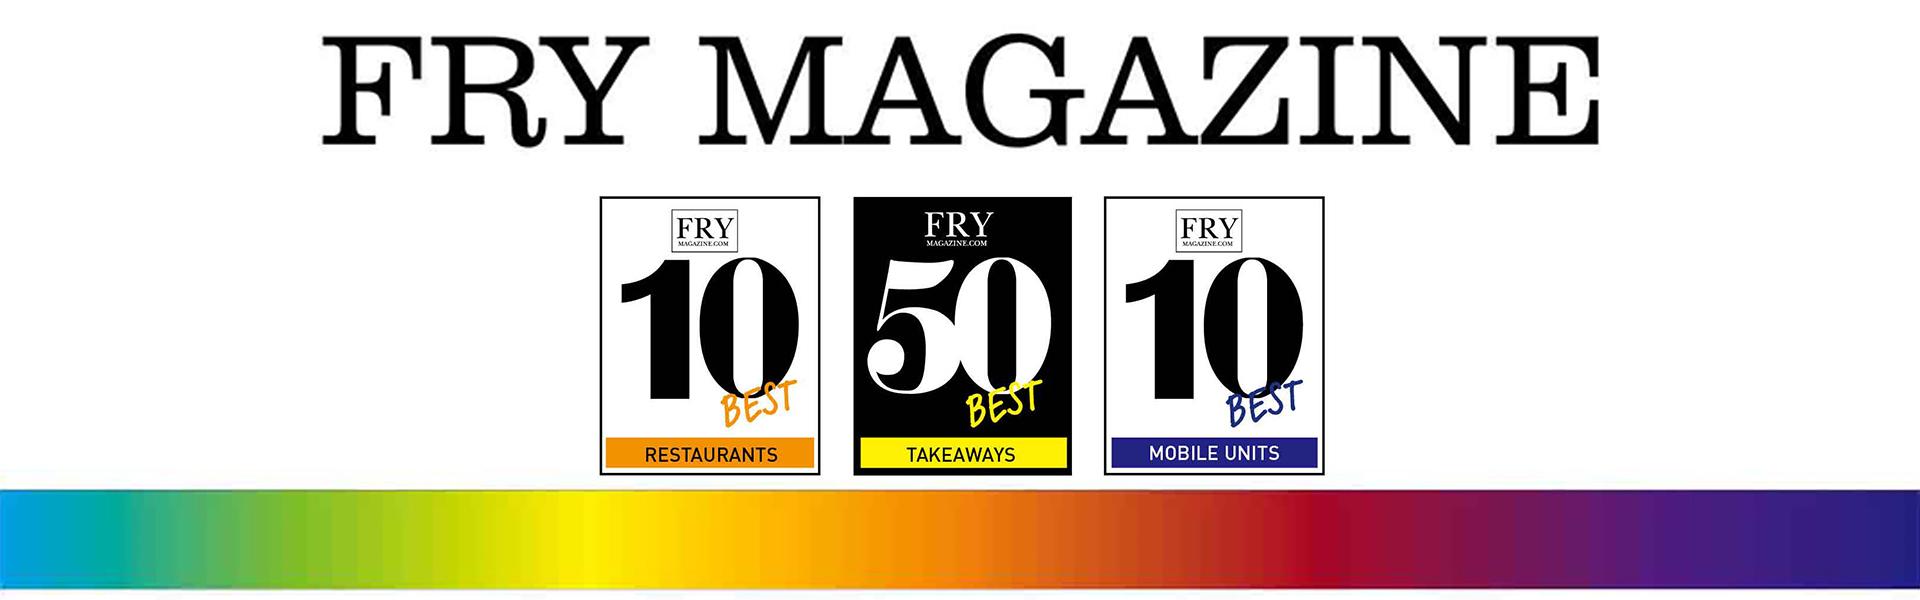 Fry Magazine's Top 50 Award